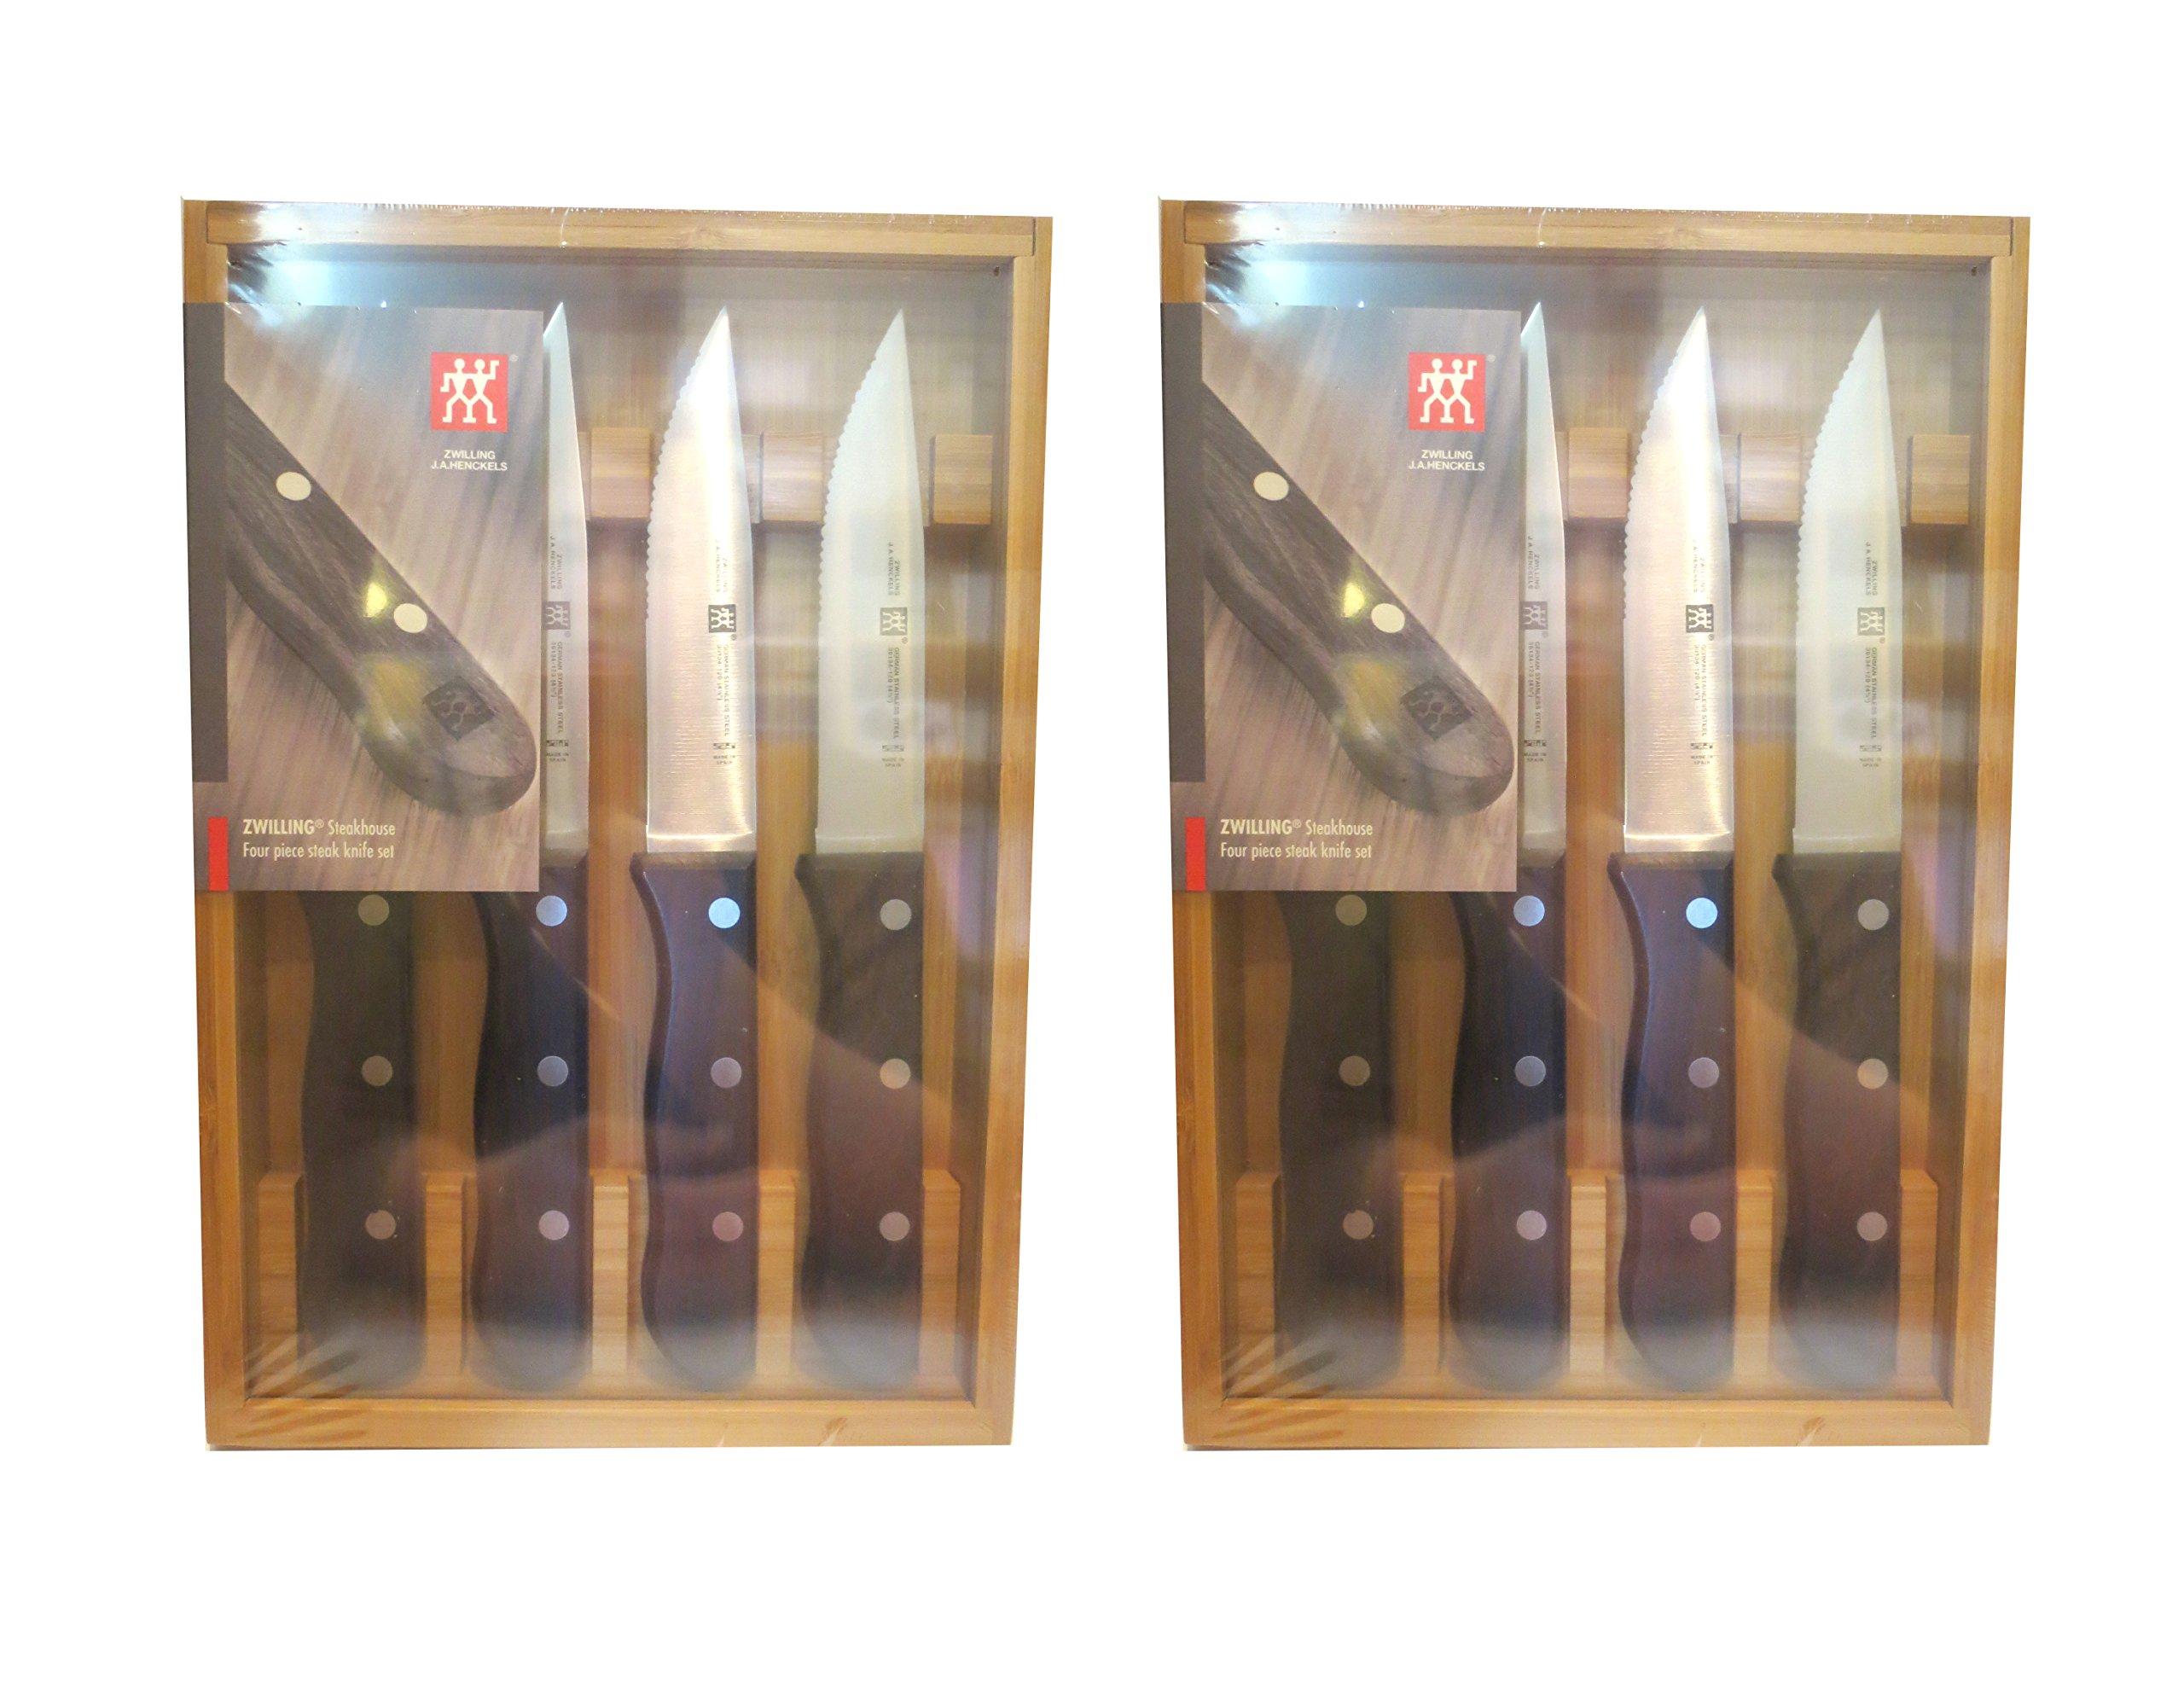 Steakhouse Knife Set - 8 Piece